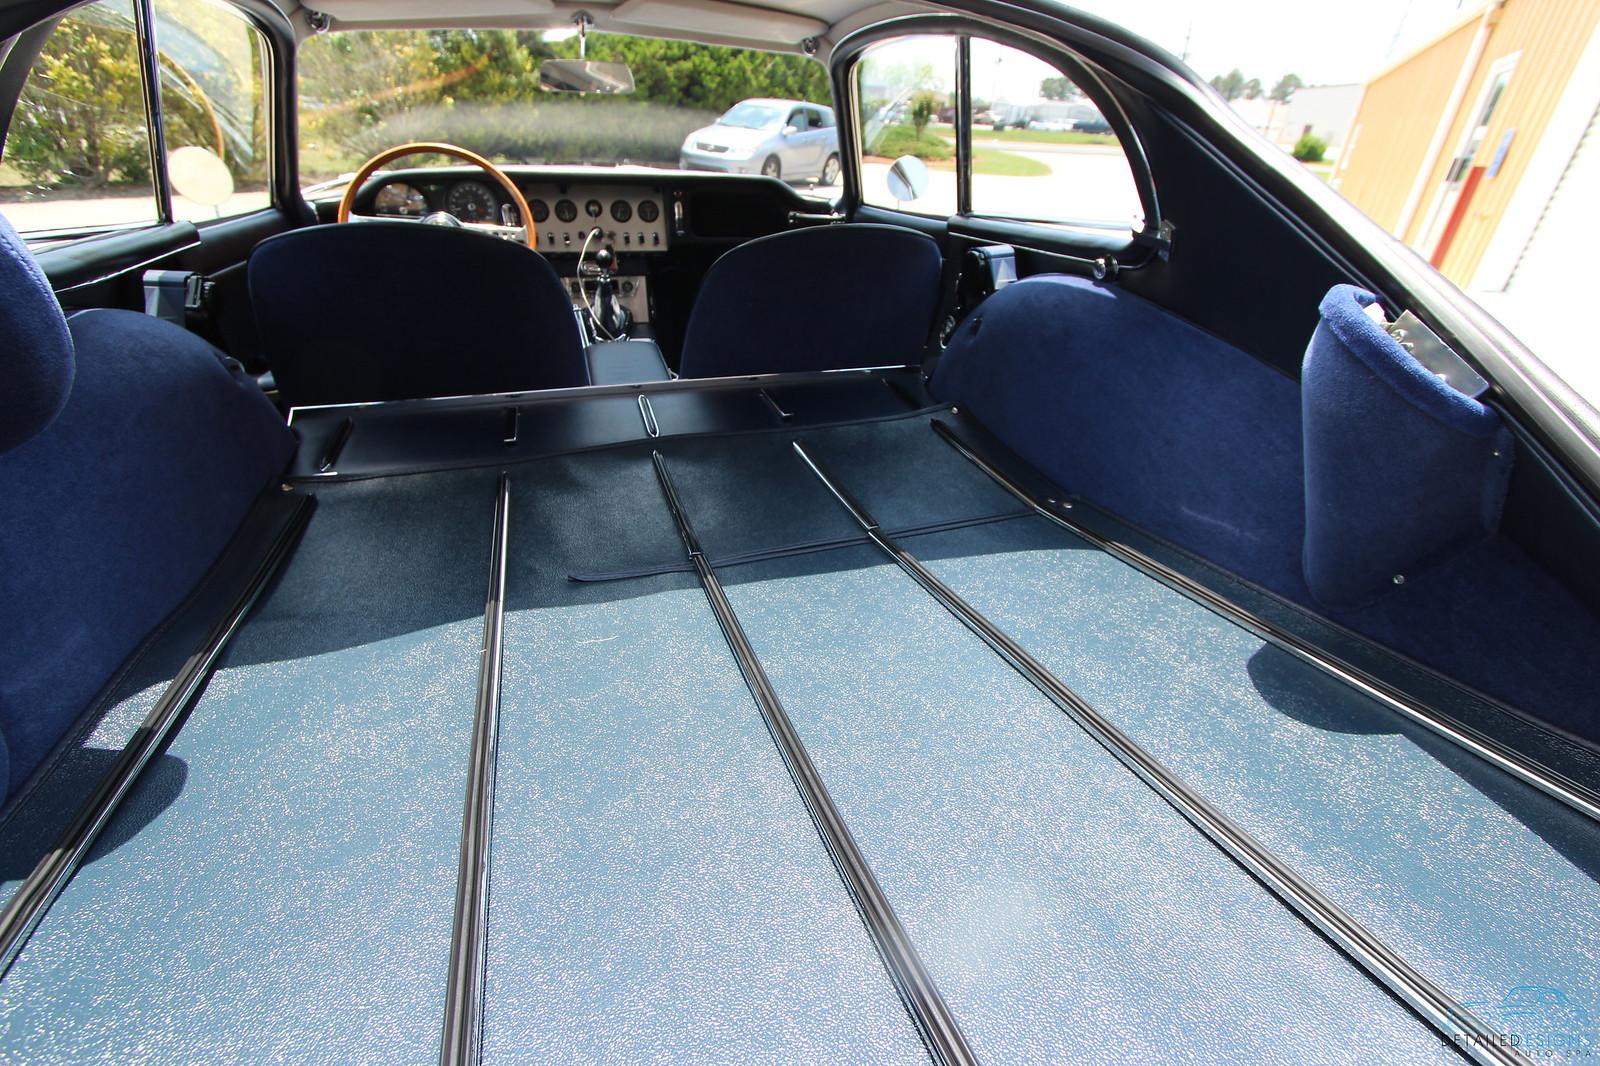 atlanta jaguar e type concours car detailing project. Black Bedroom Furniture Sets. Home Design Ideas